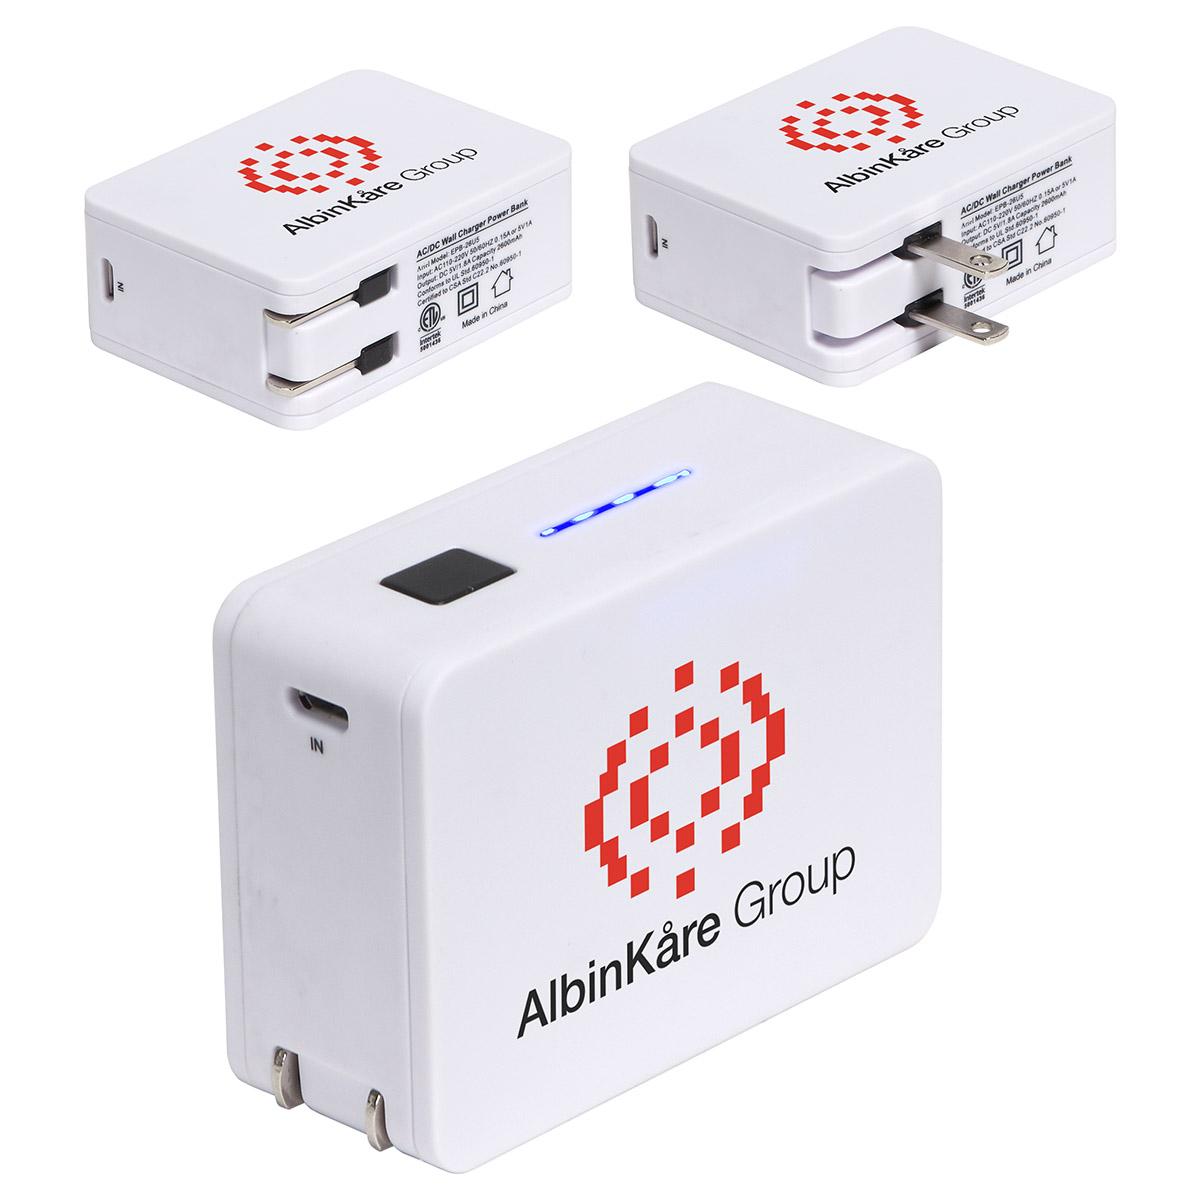 2-in-1 USB Wall Charger Power Bank - 2600mAh, EPB-26U5 - 1 Colour Imprint